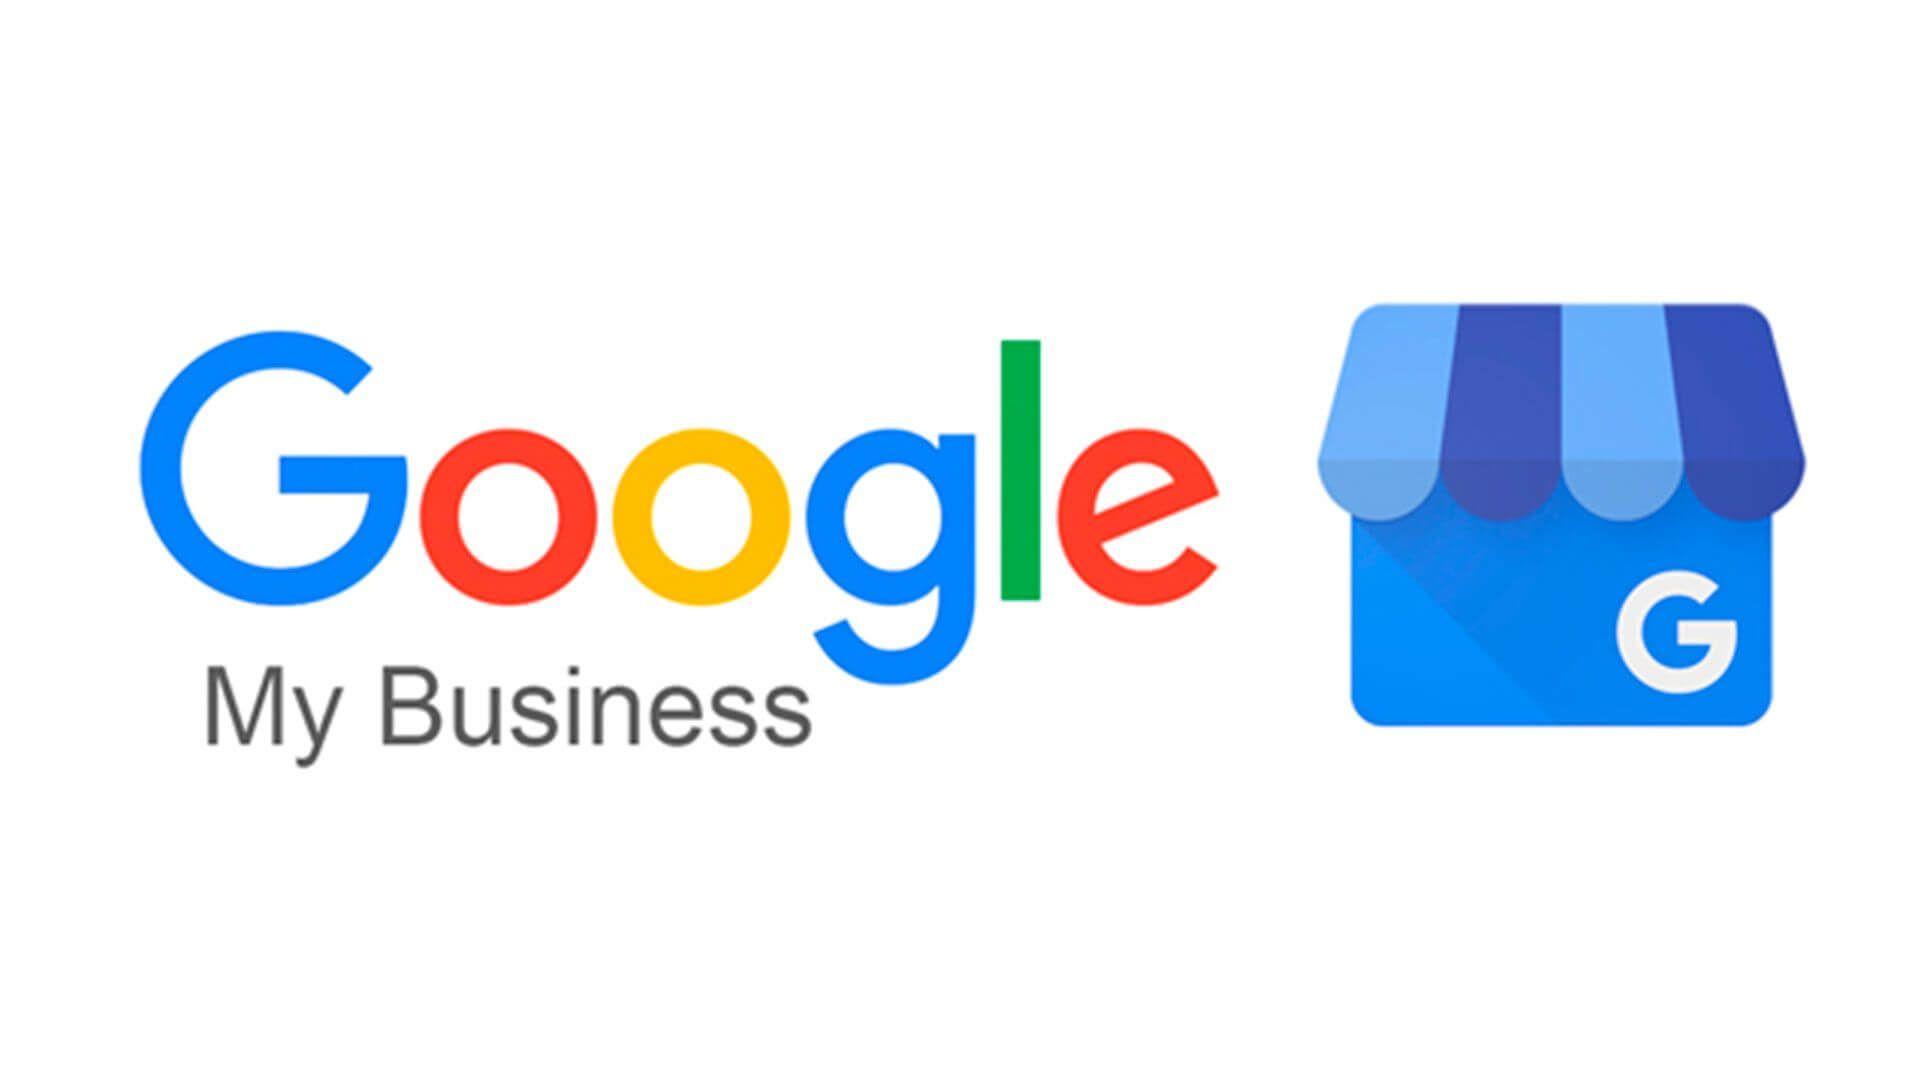 Agencia Sidecar blog-agencia-sidecar-google-my-business-portada Google My Business, usa el SEO local para tener más visibilidad